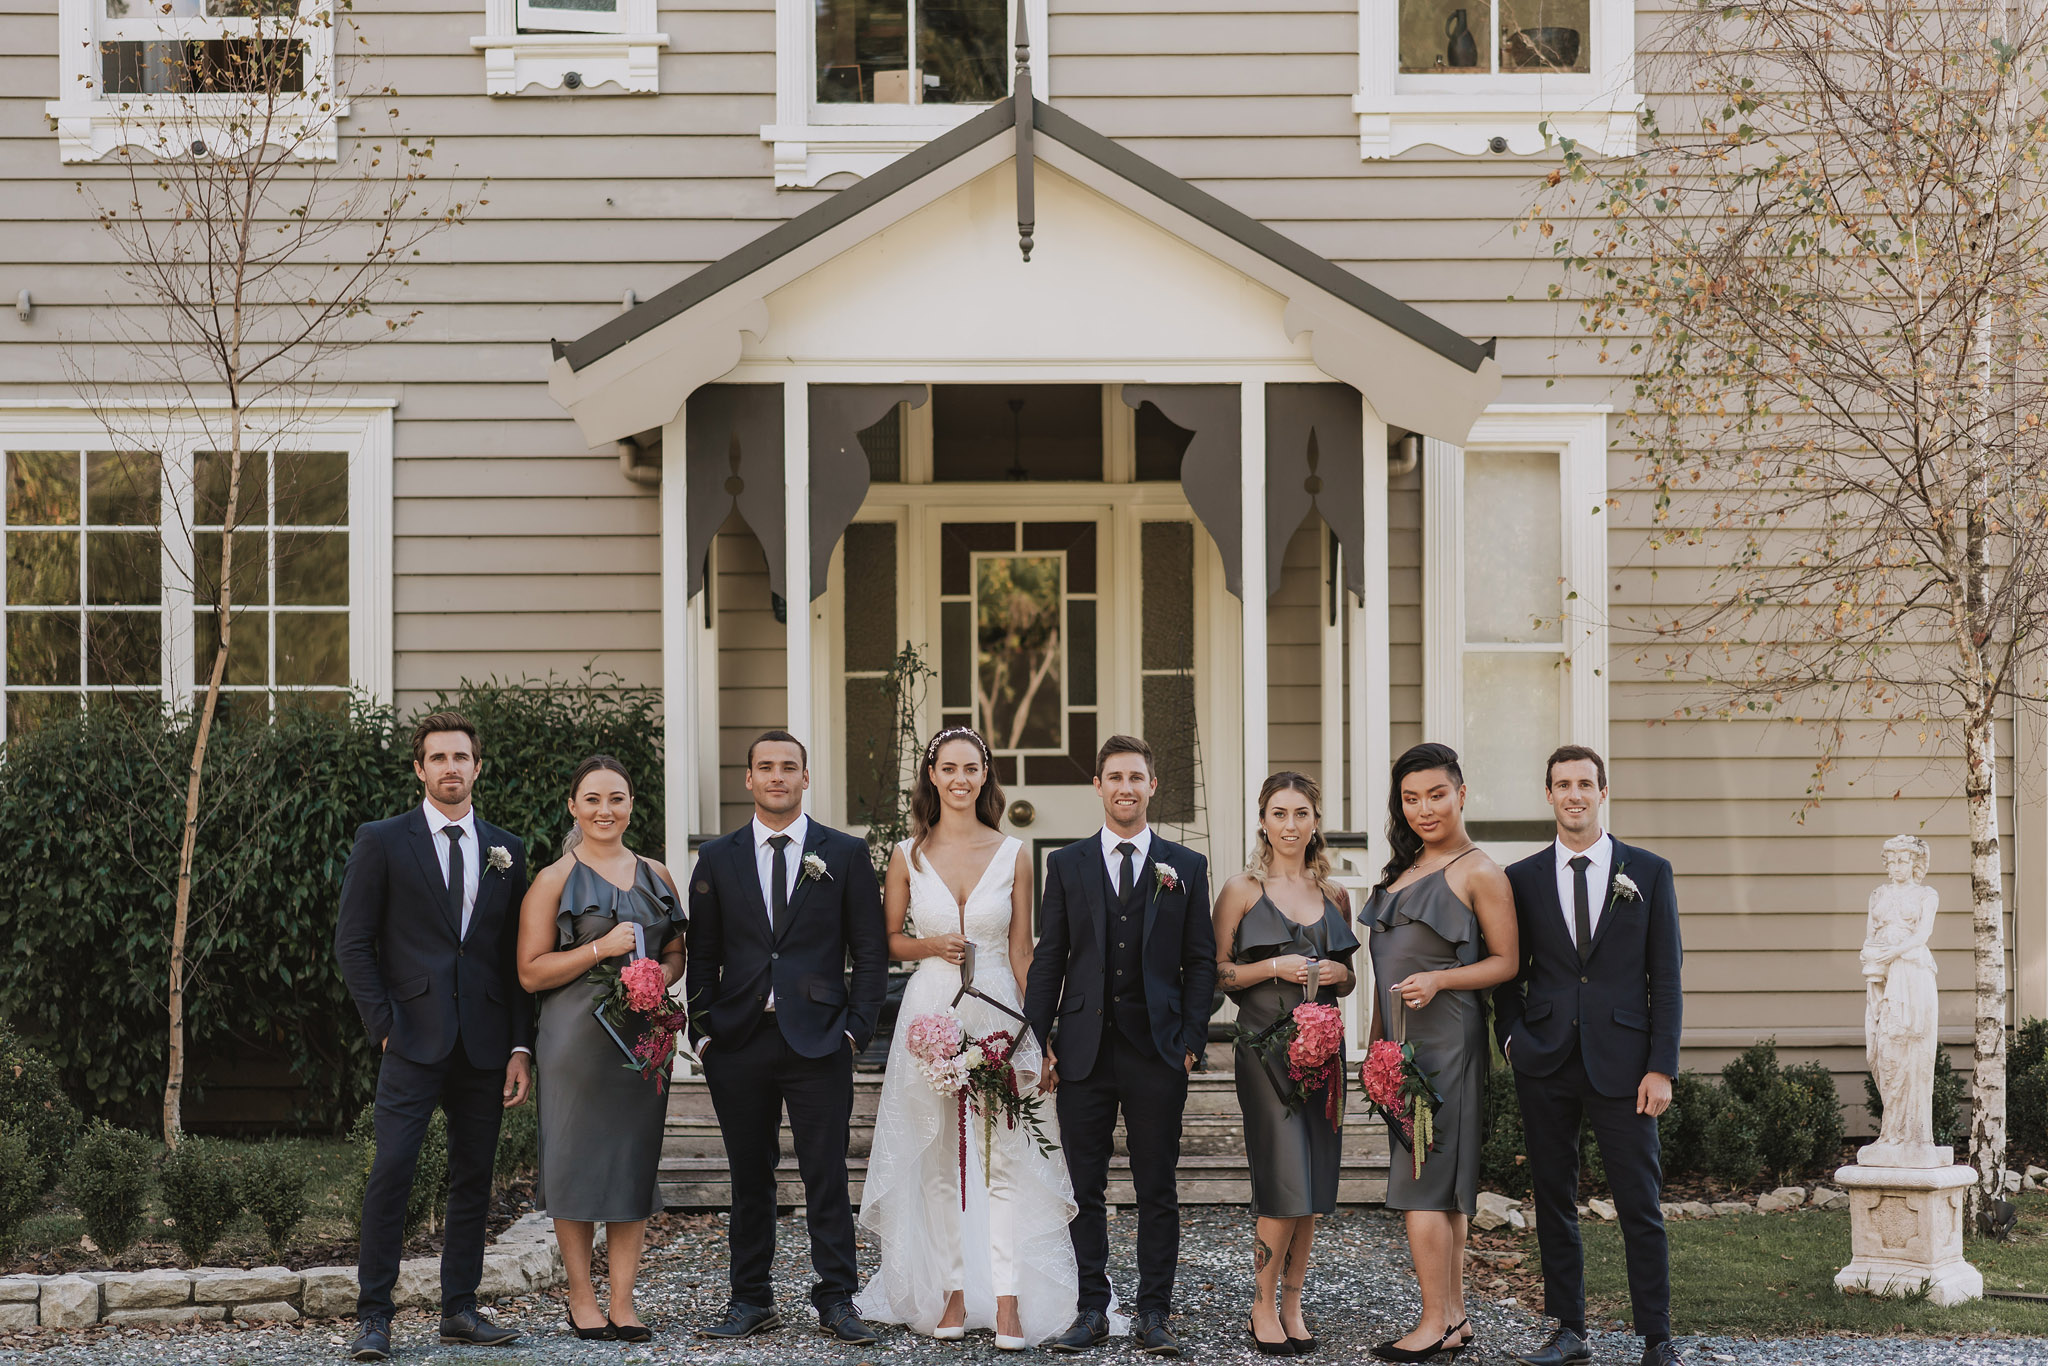 rambo-estrada-rubymatt-kauri-bay-boomrock-auckland-wedding-photographers-0346-c copy.jpg